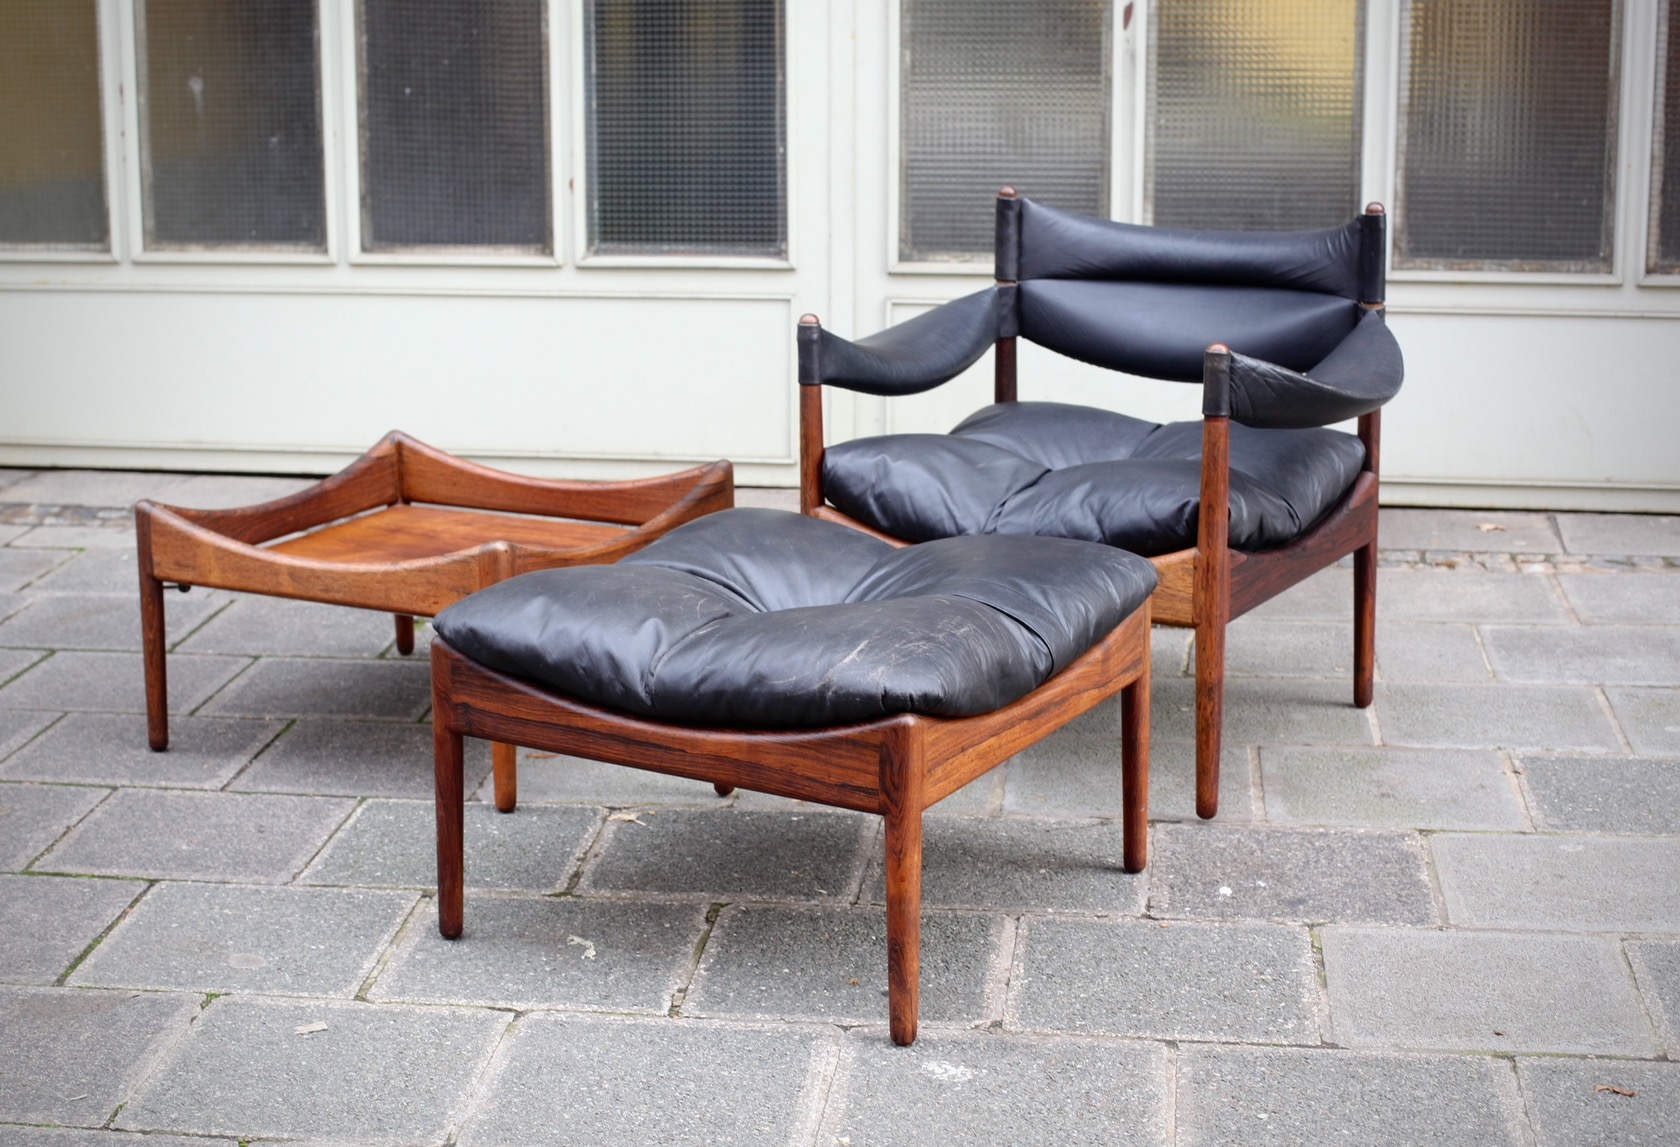 sitzgruppe modus von kristian vedel raumwunder. Black Bedroom Furniture Sets. Home Design Ideas